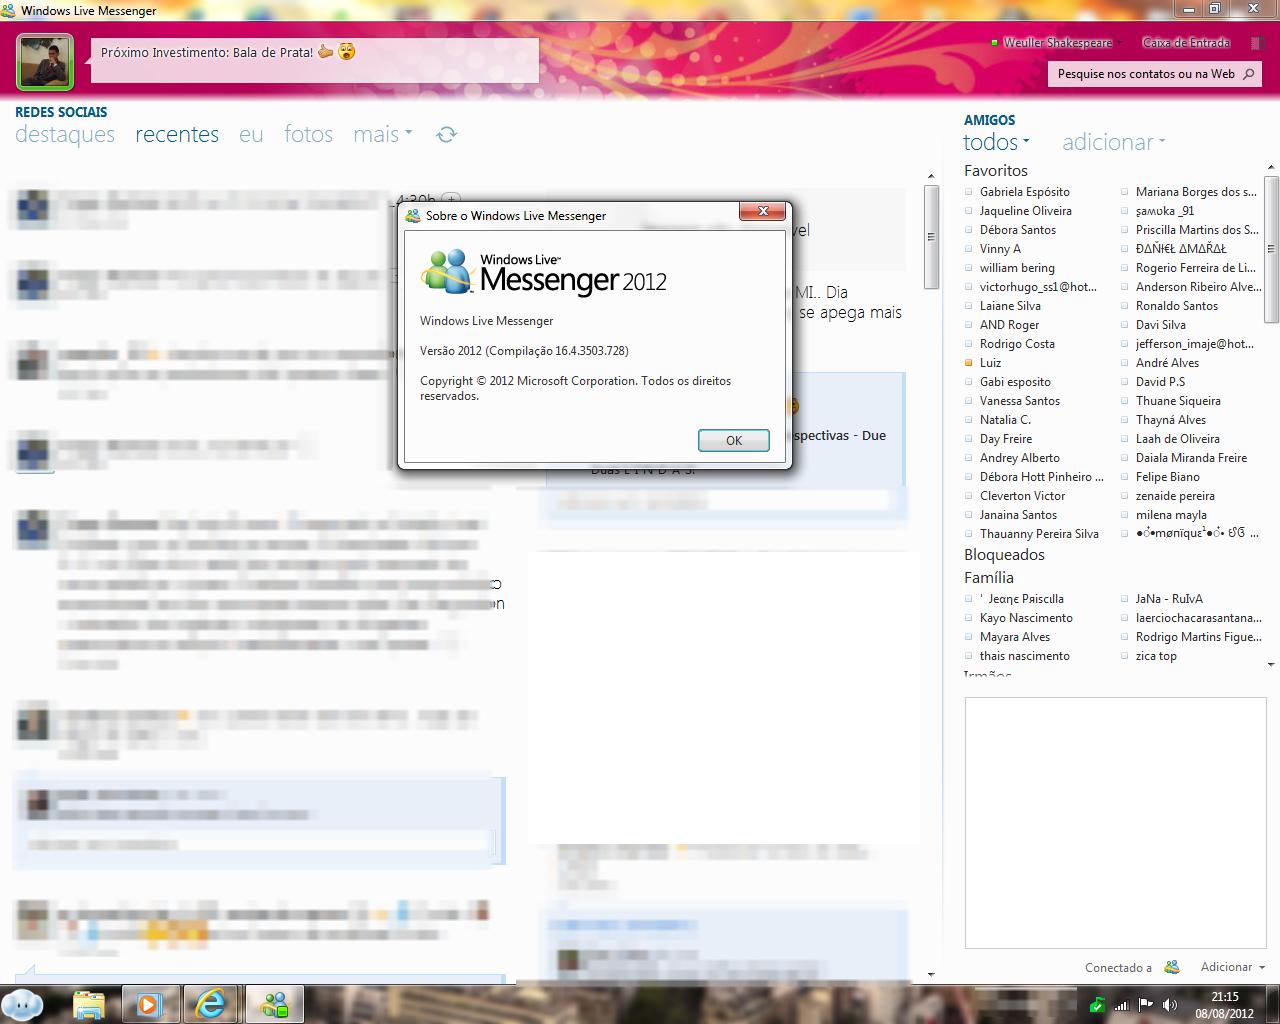 msn messenger 2012 w a informática